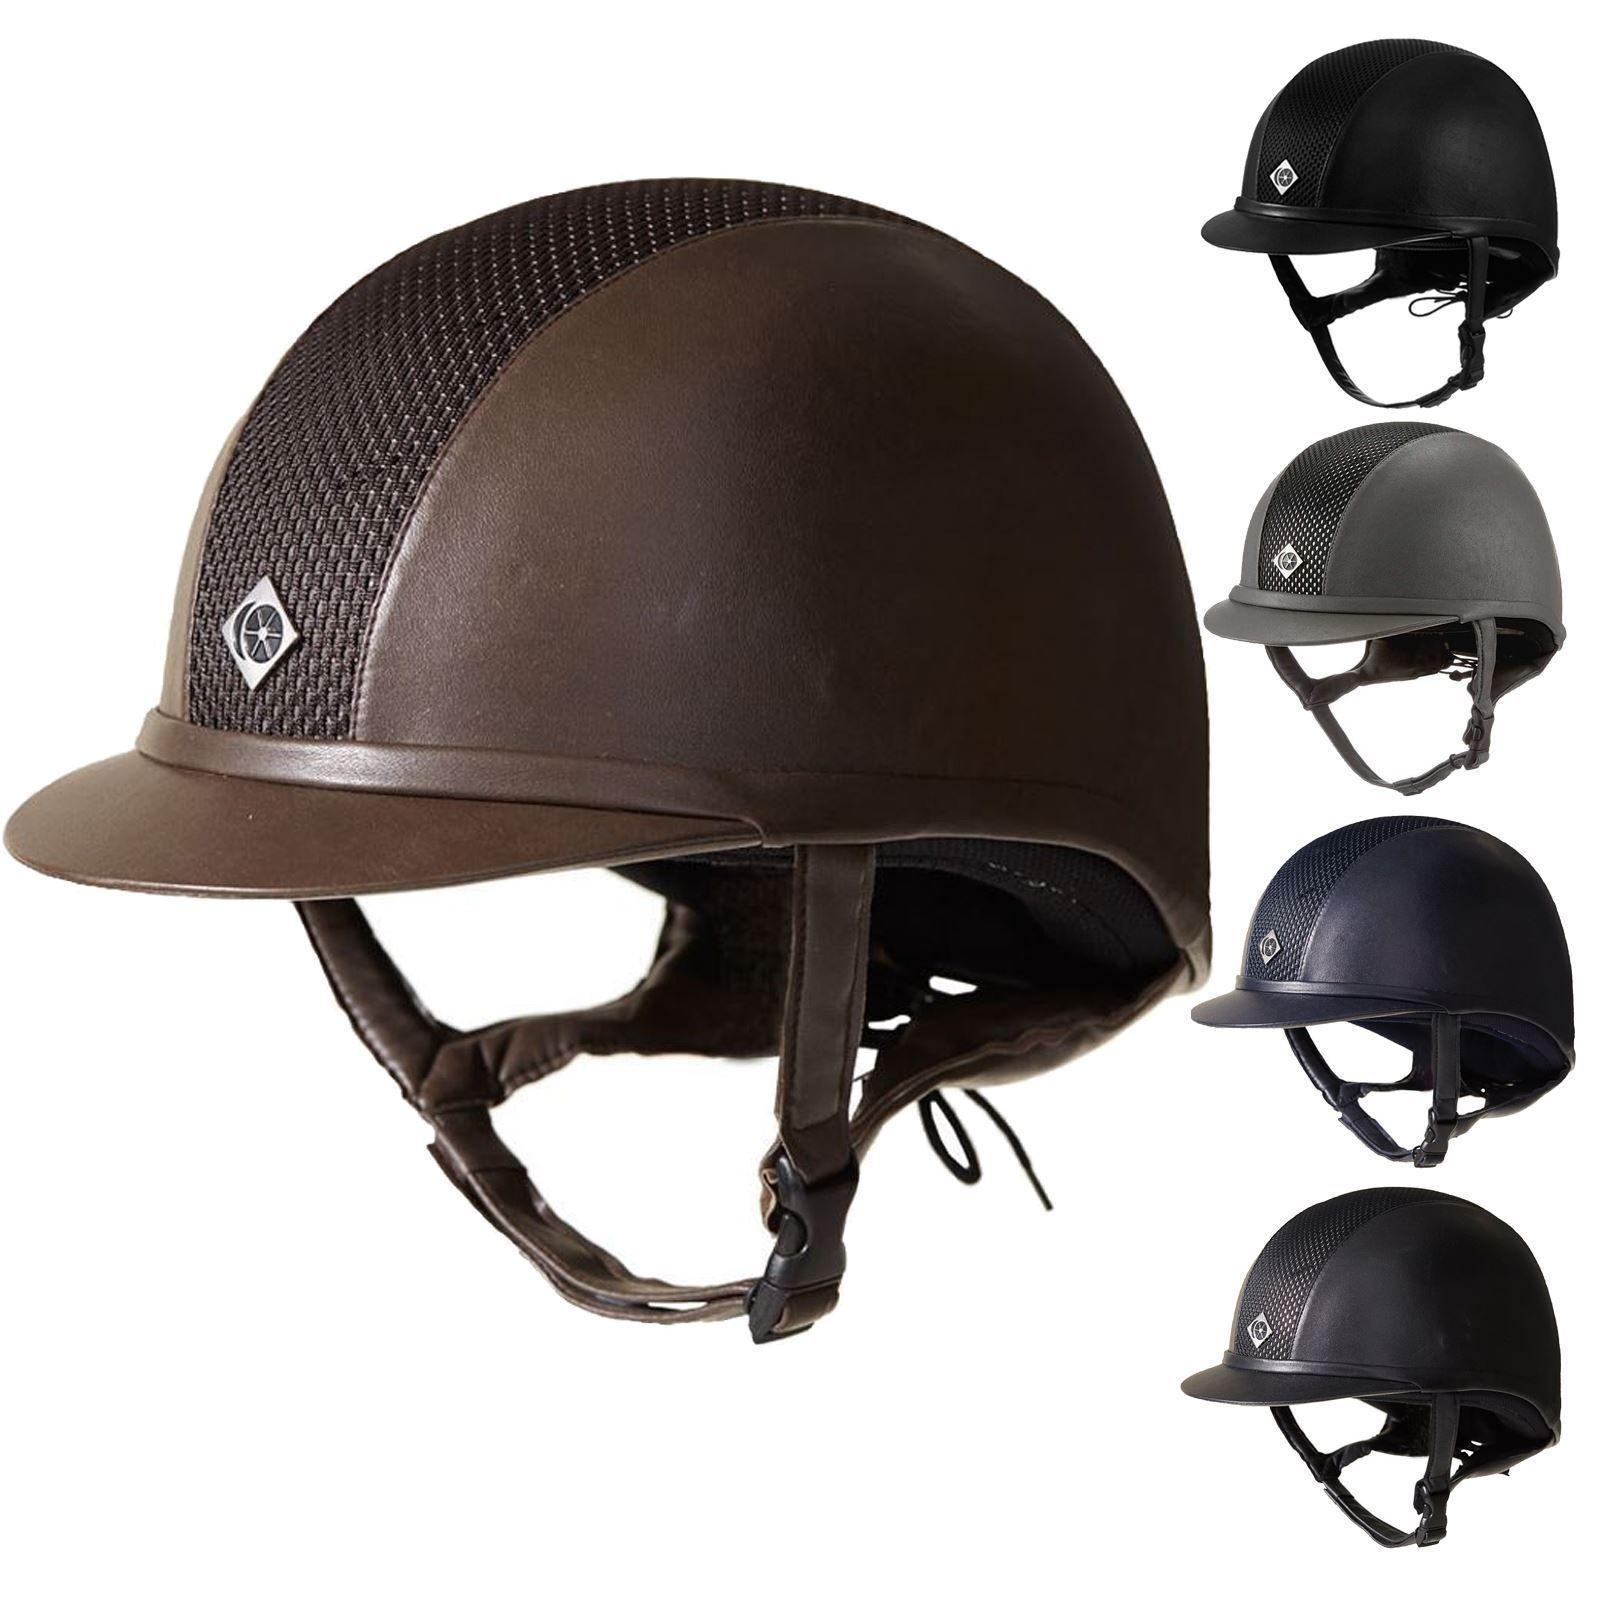 Charles Owen AYR8 Fau Cuero Equitación Doma mostrando casco de seguridad PAS015